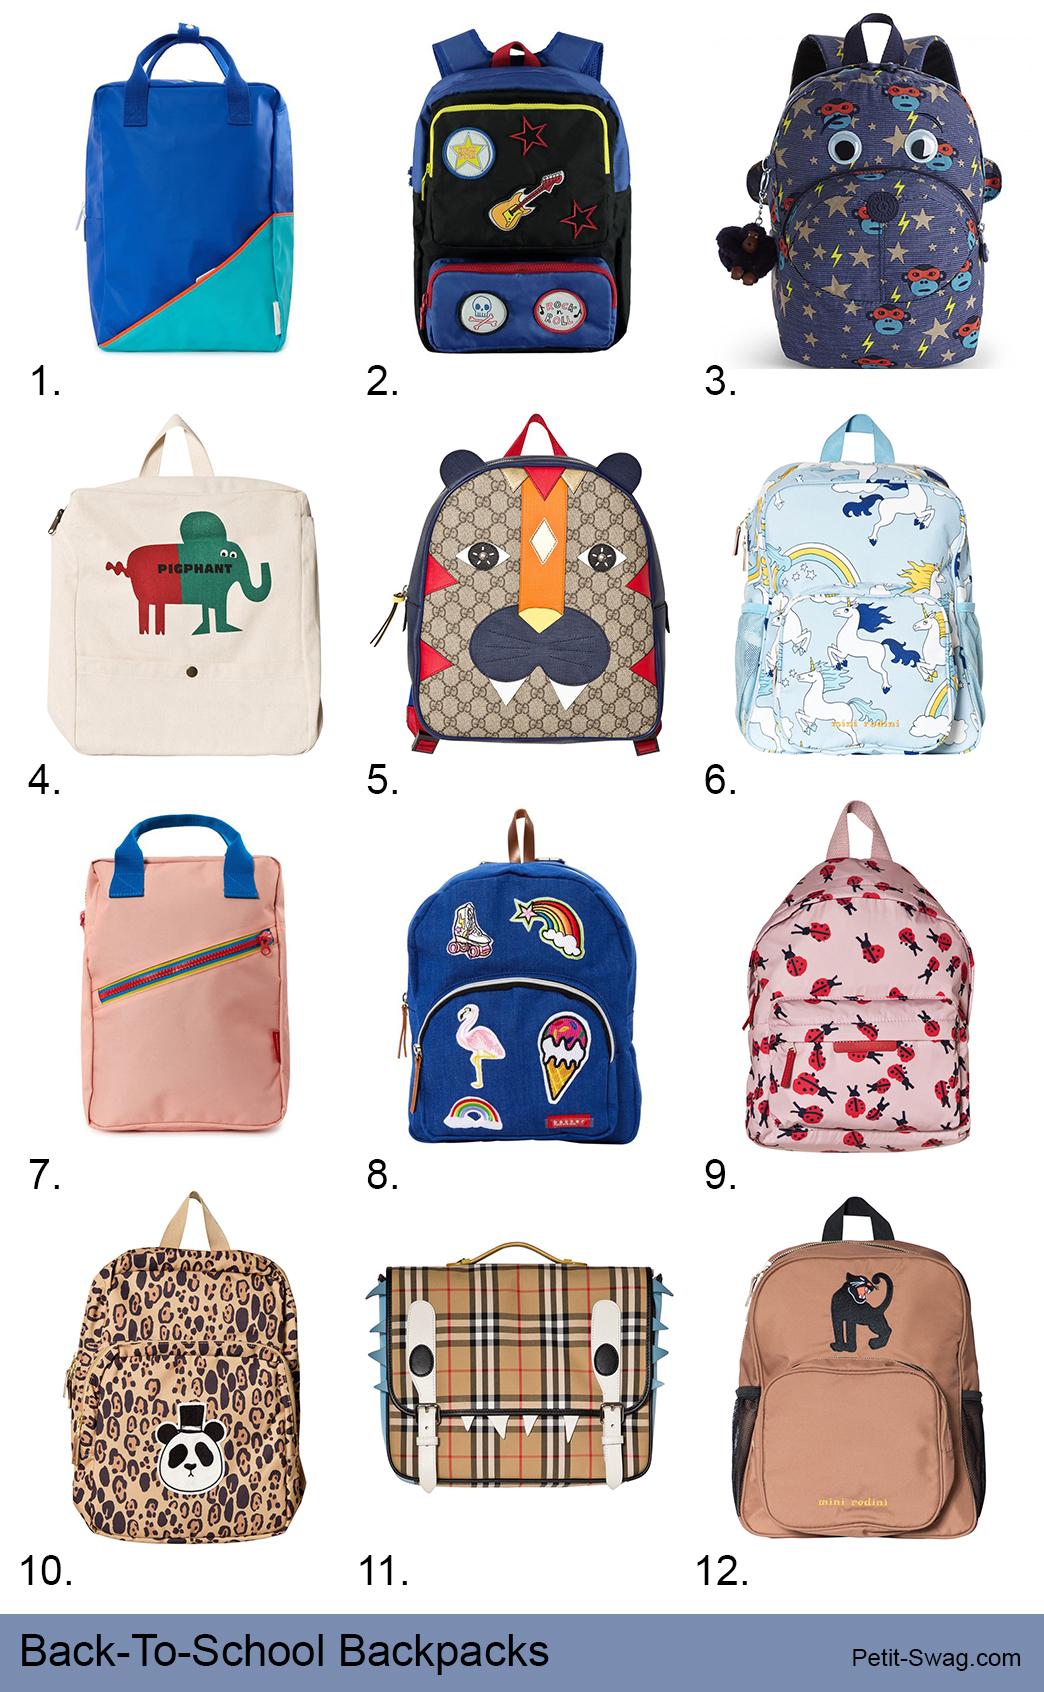 Back-To-School Backpacks | petit-swag.com